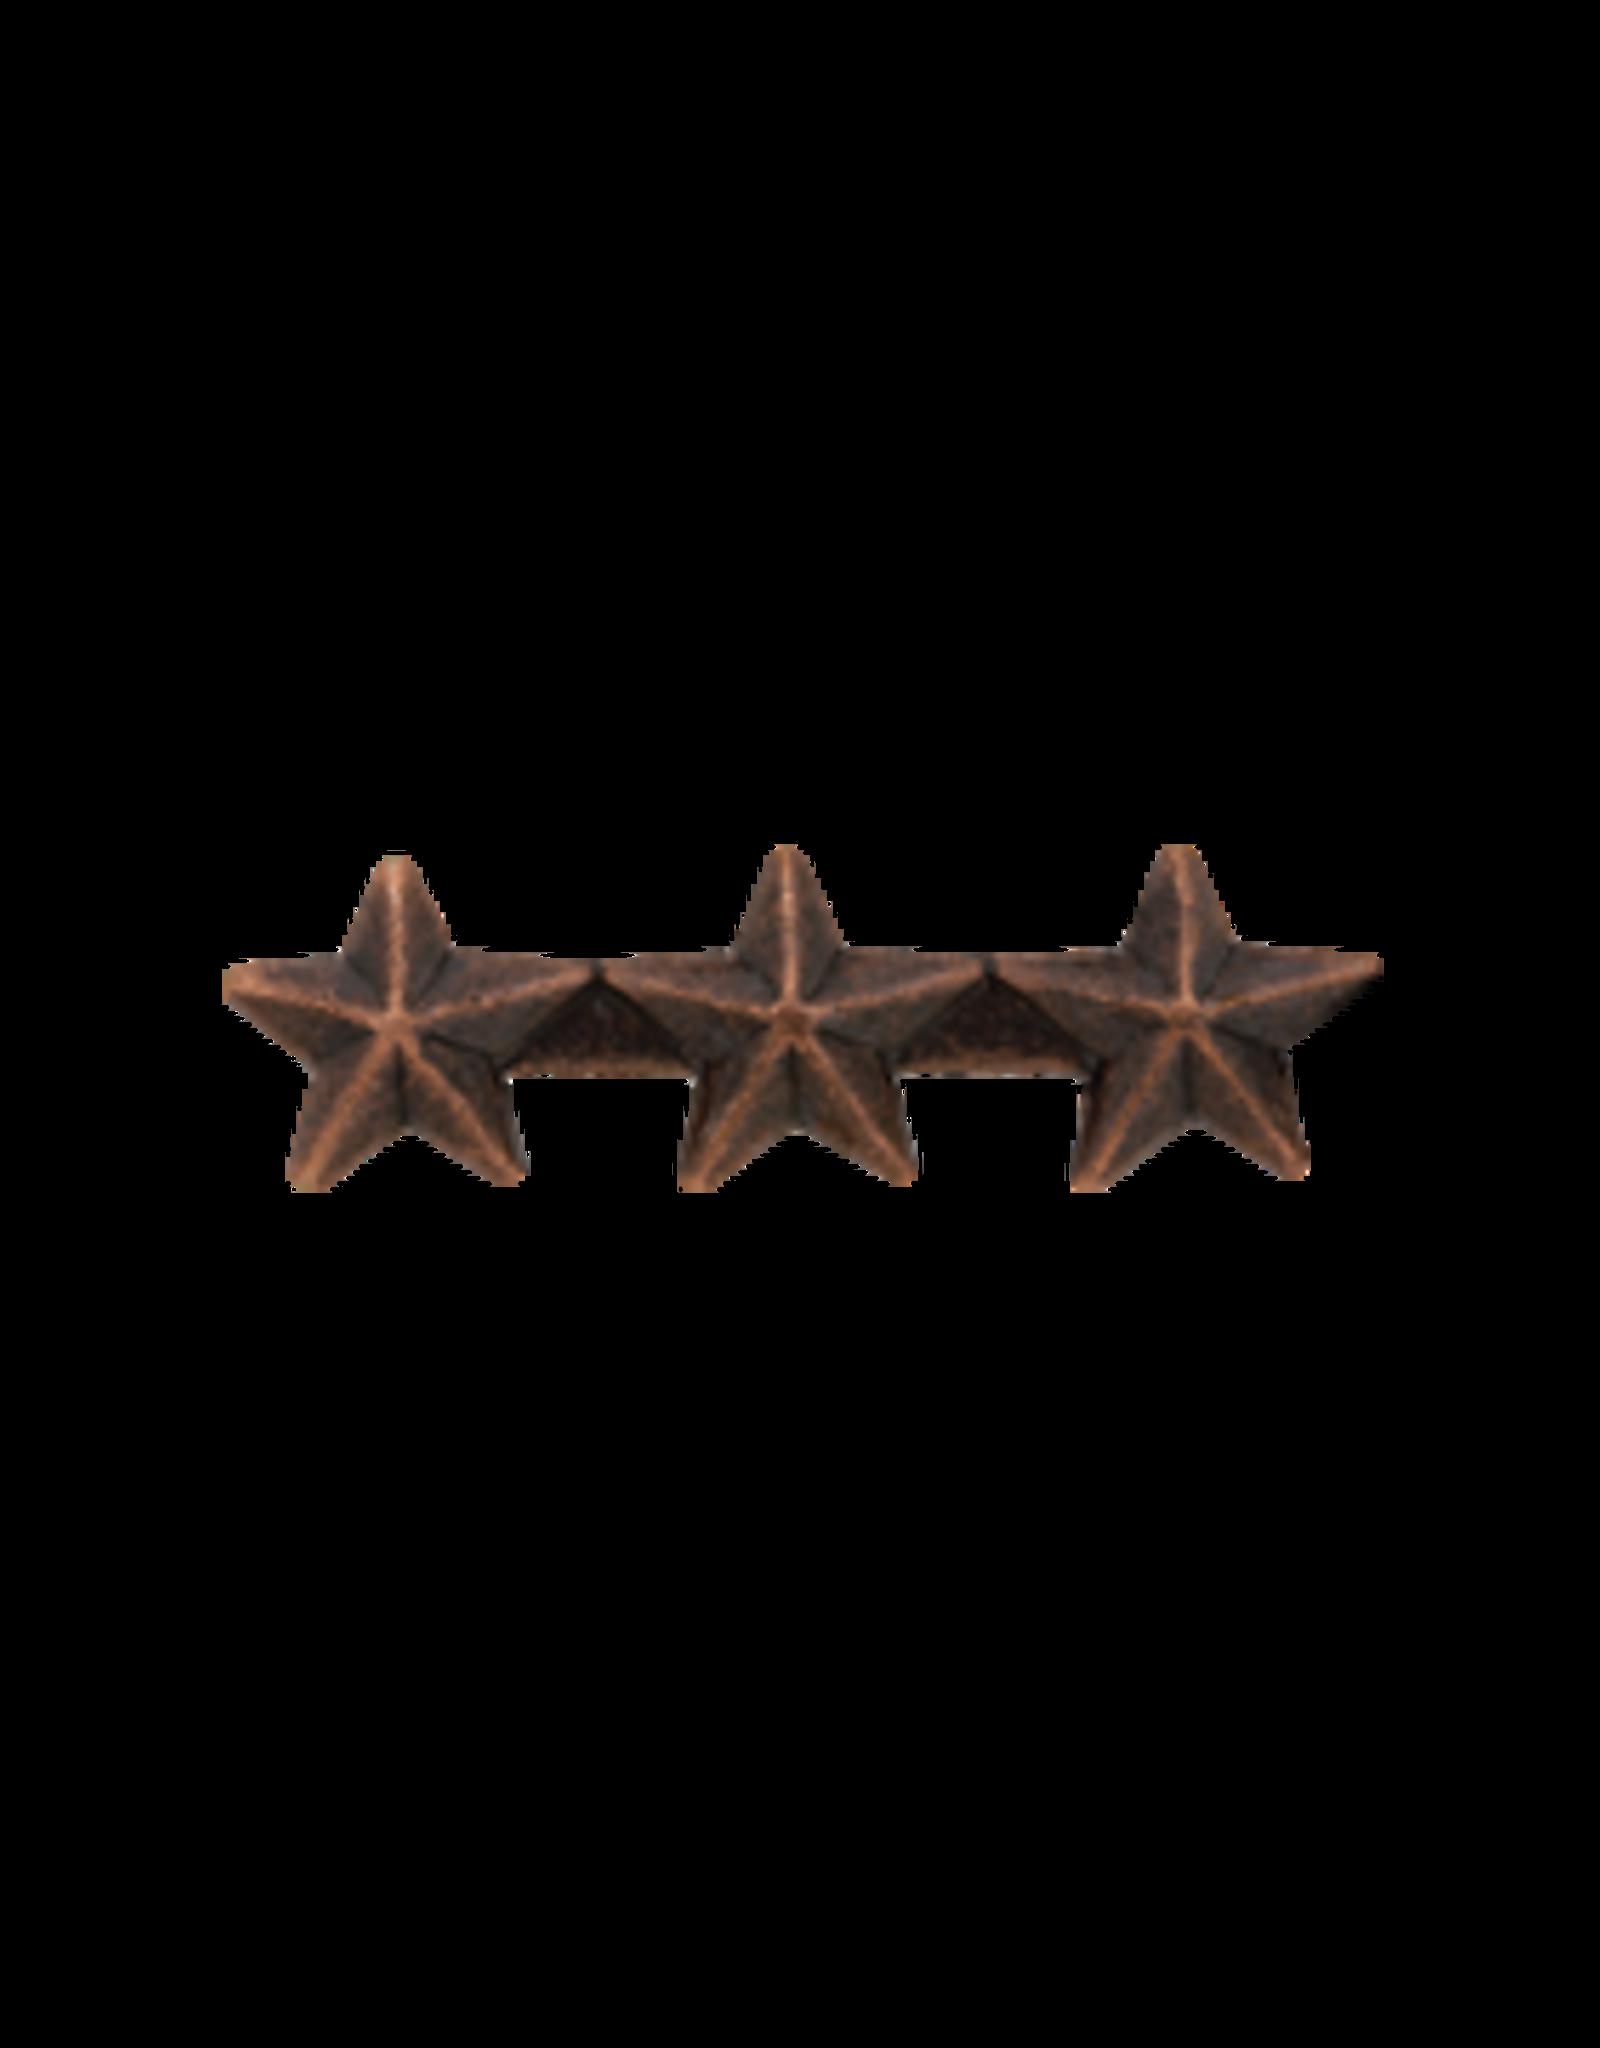 3 Star Cluster